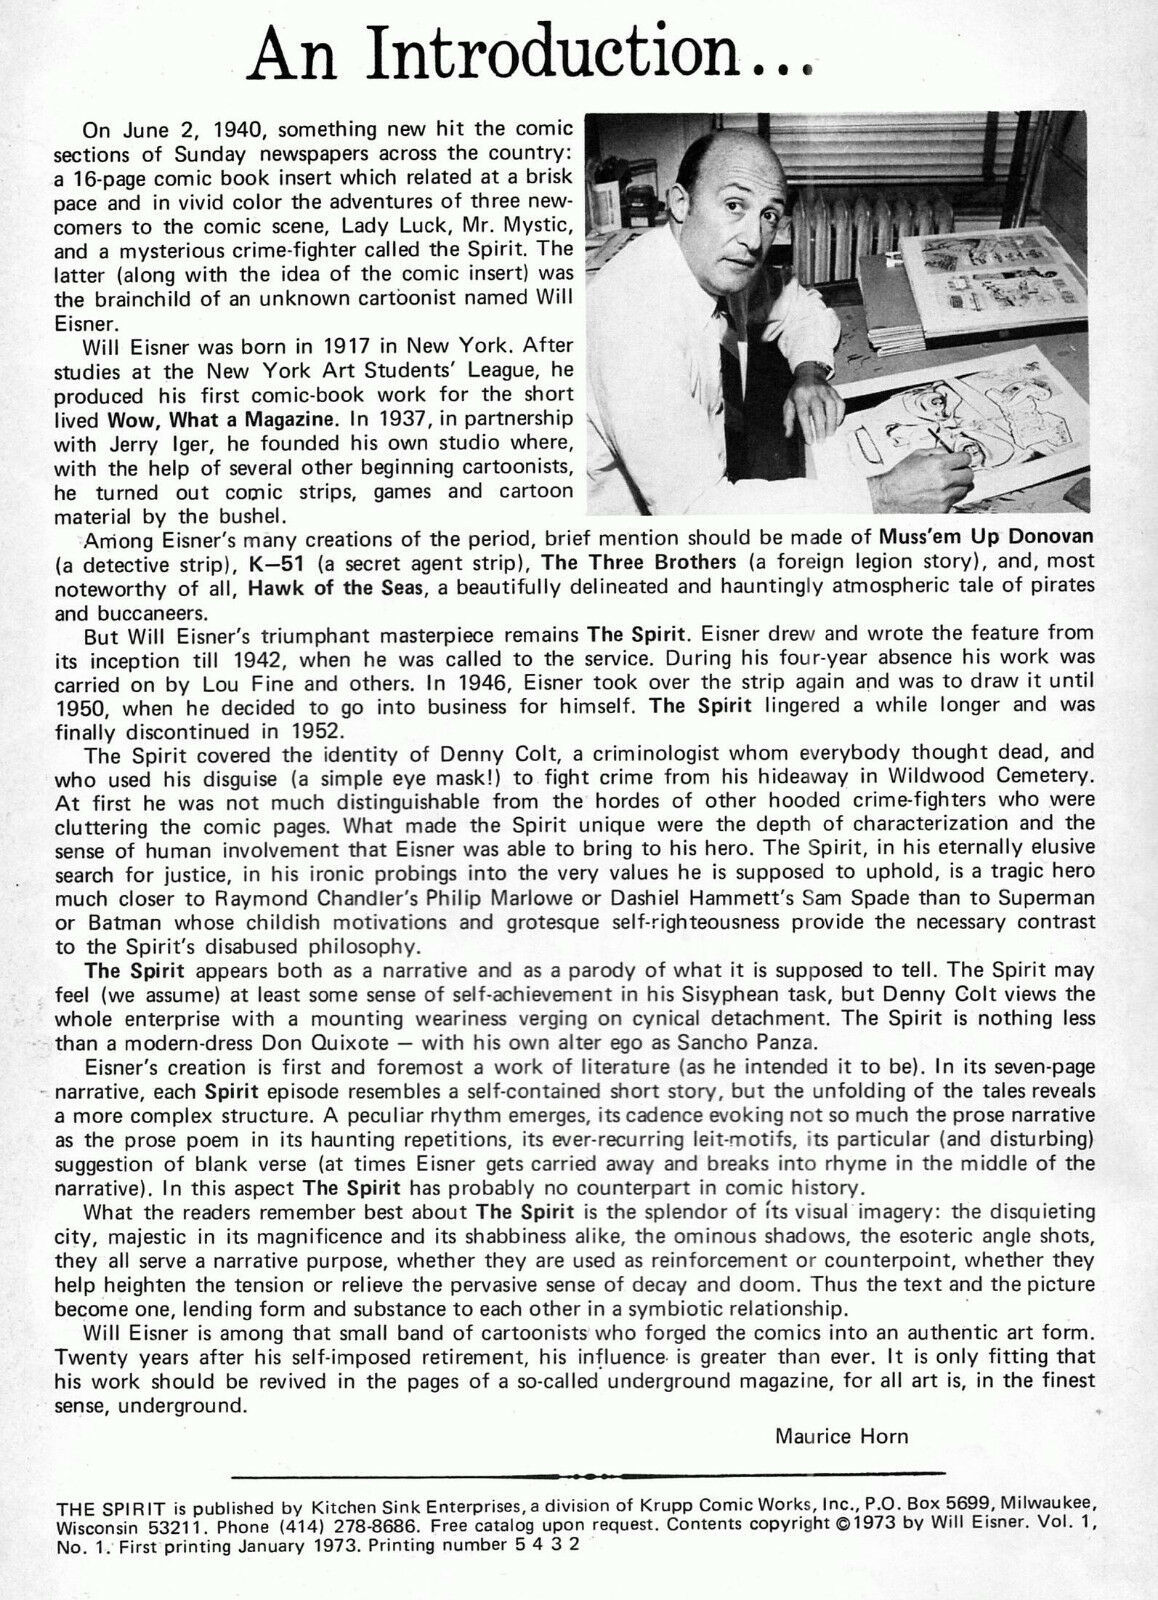 Spirit #1, Kitchen Sink 1973, - 2nd printing, Will Eisner, reprints from 1946 -